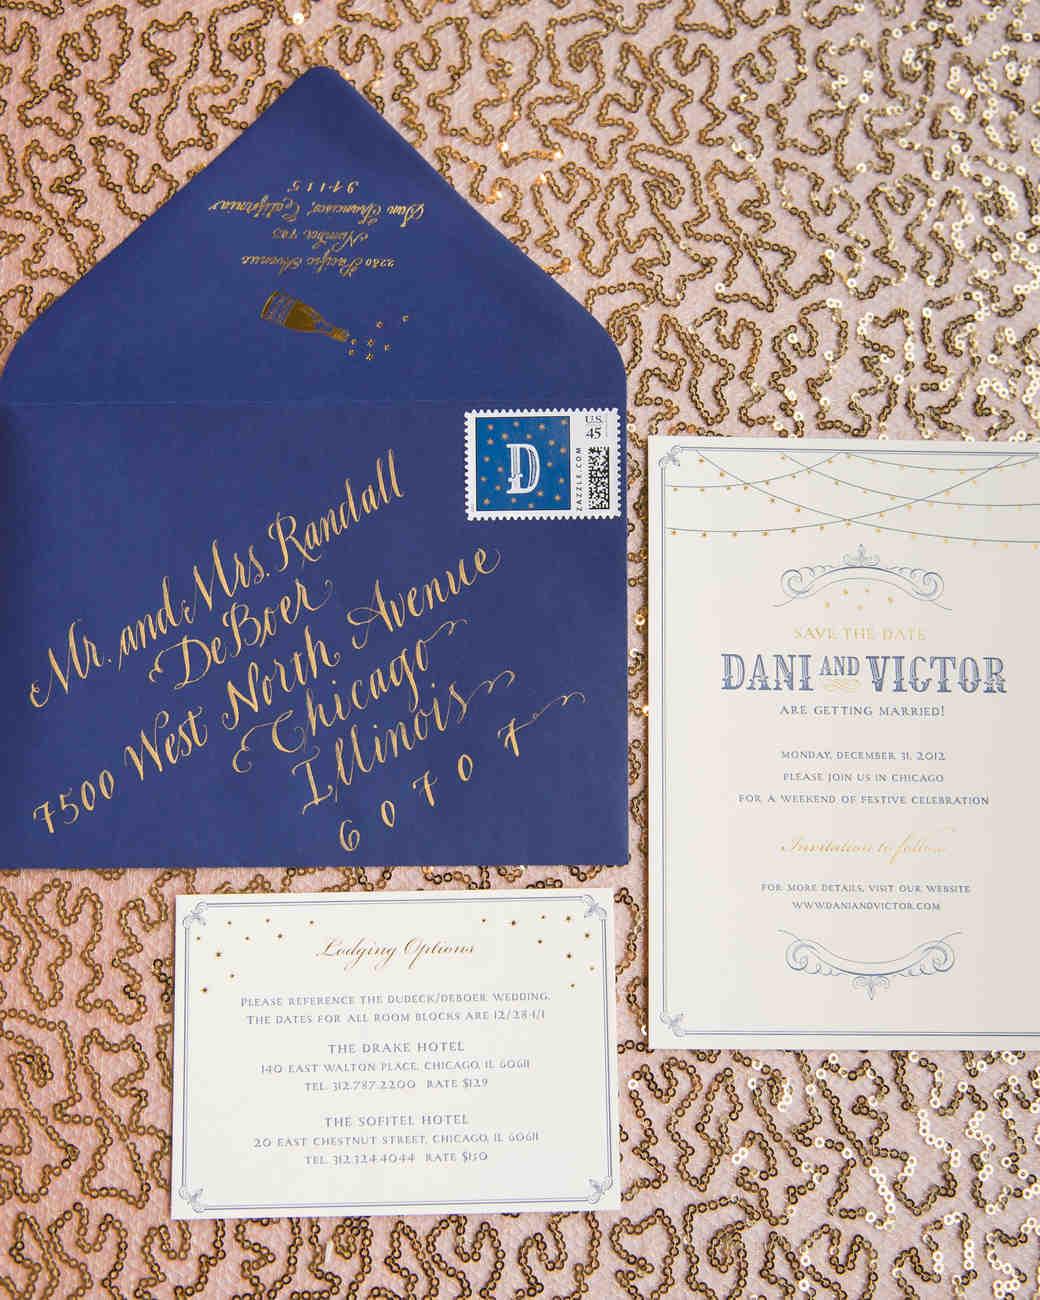 New Yearu0027s Eve Wedding Invitations